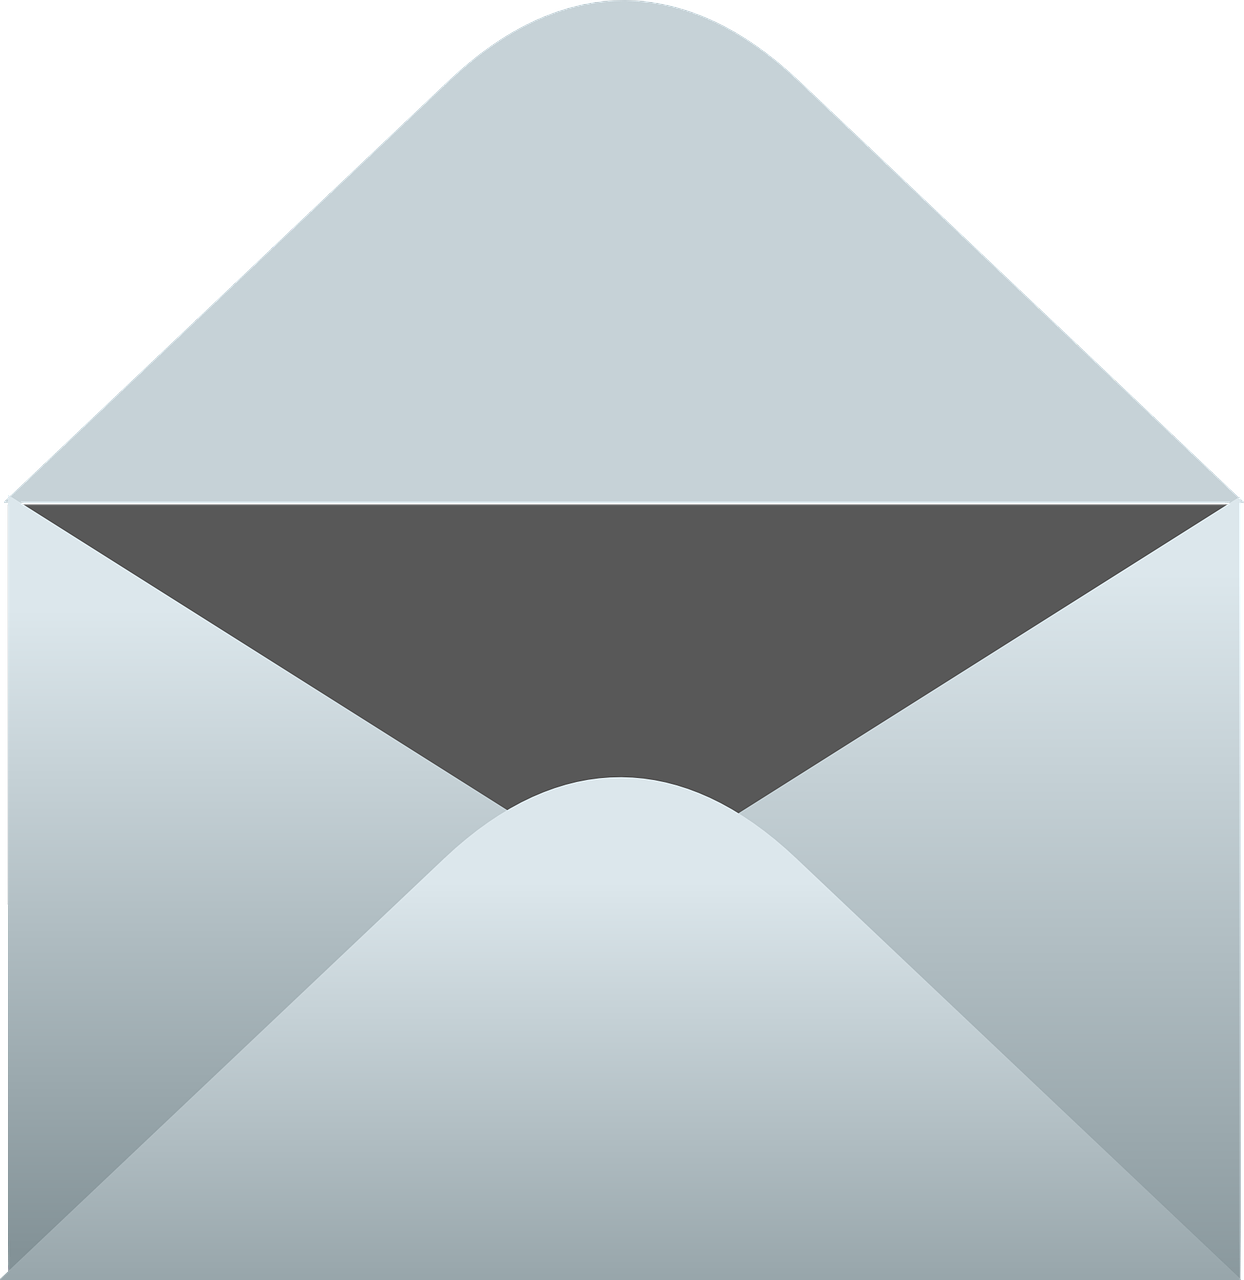 Envelope clipart evelope. Open mountain messenger